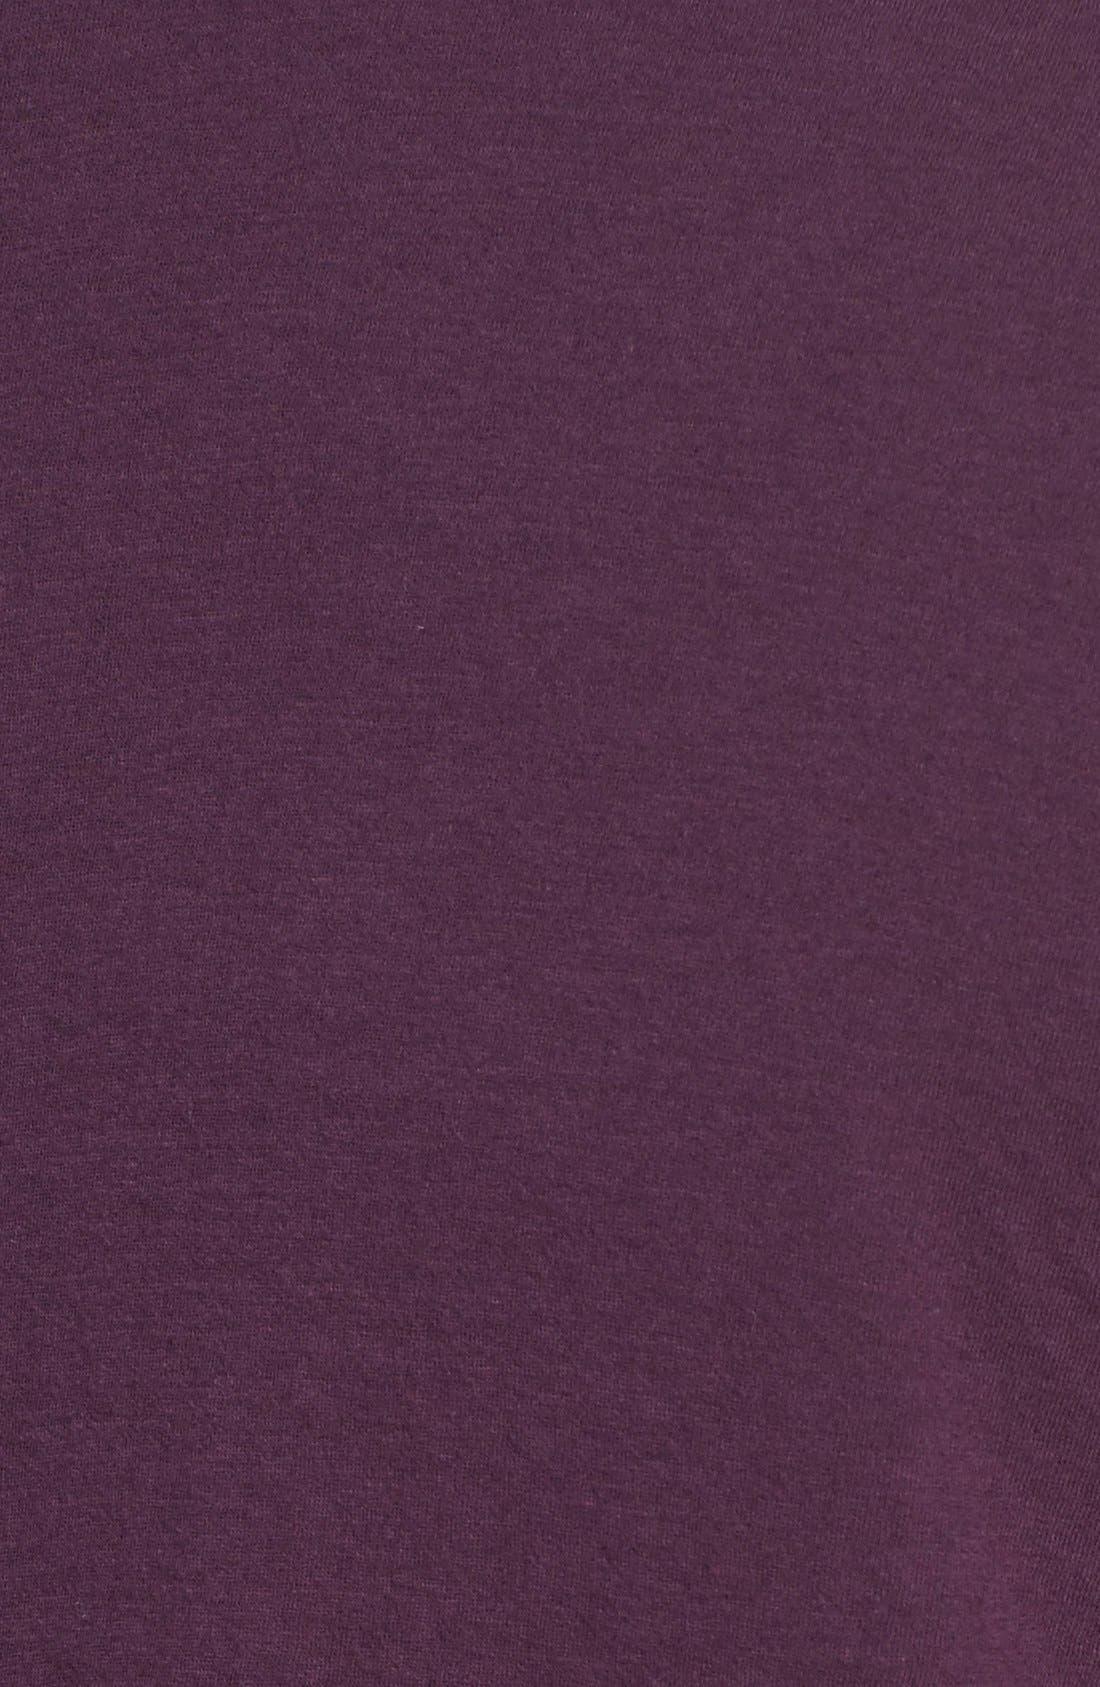 Long Sleeve Crewneck T-Shirt,                             Alternate thumbnail 20, color,